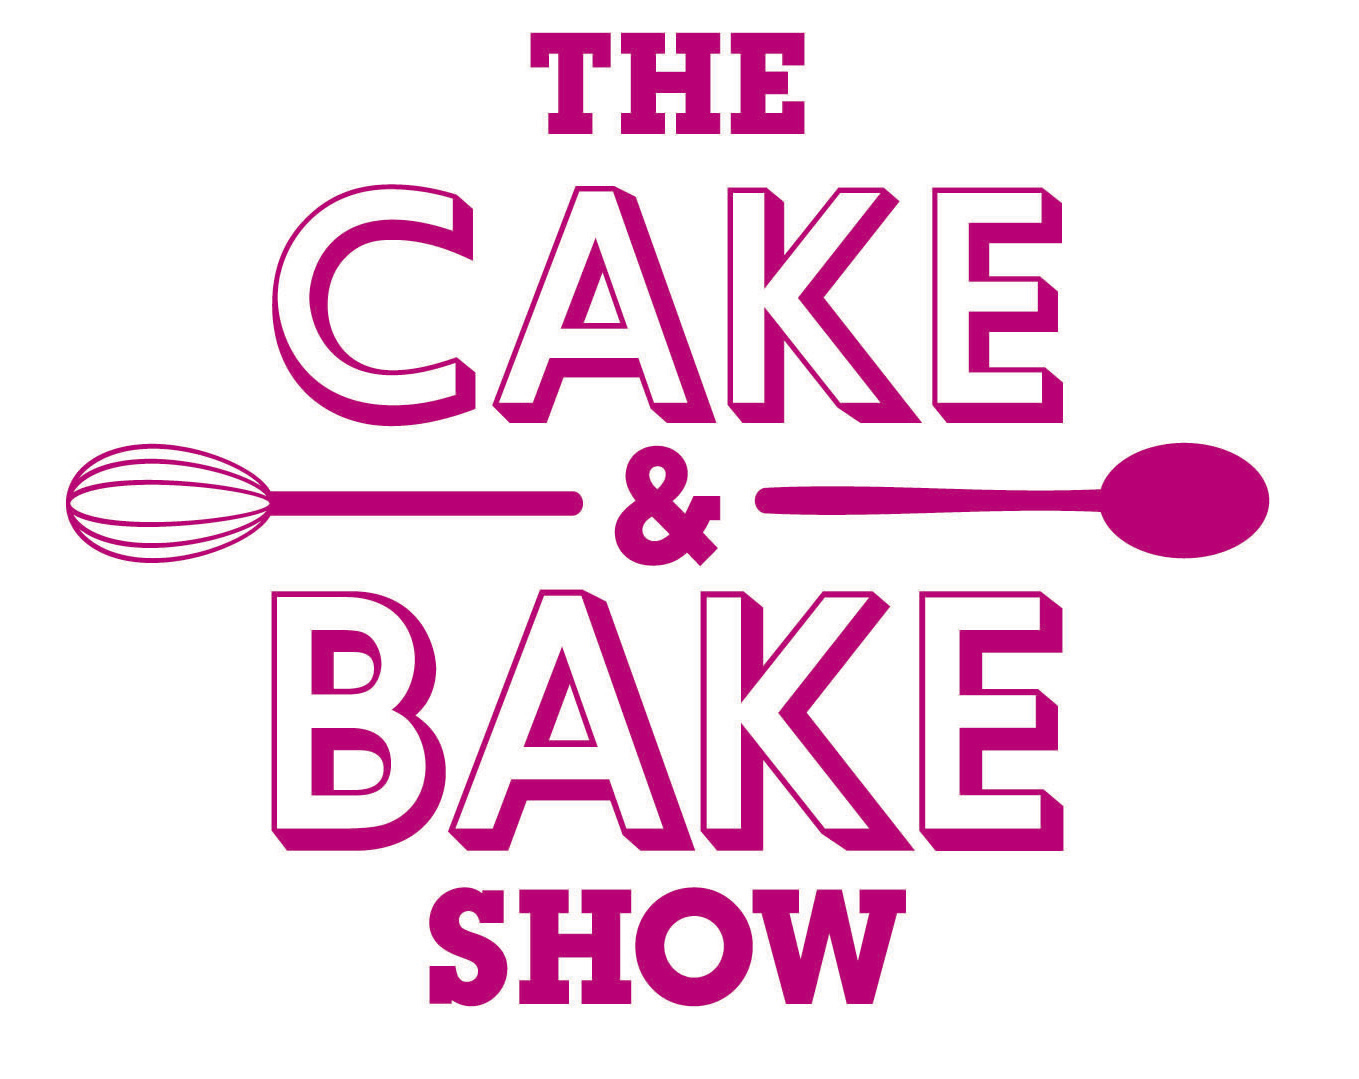 Cake & Bake show logo